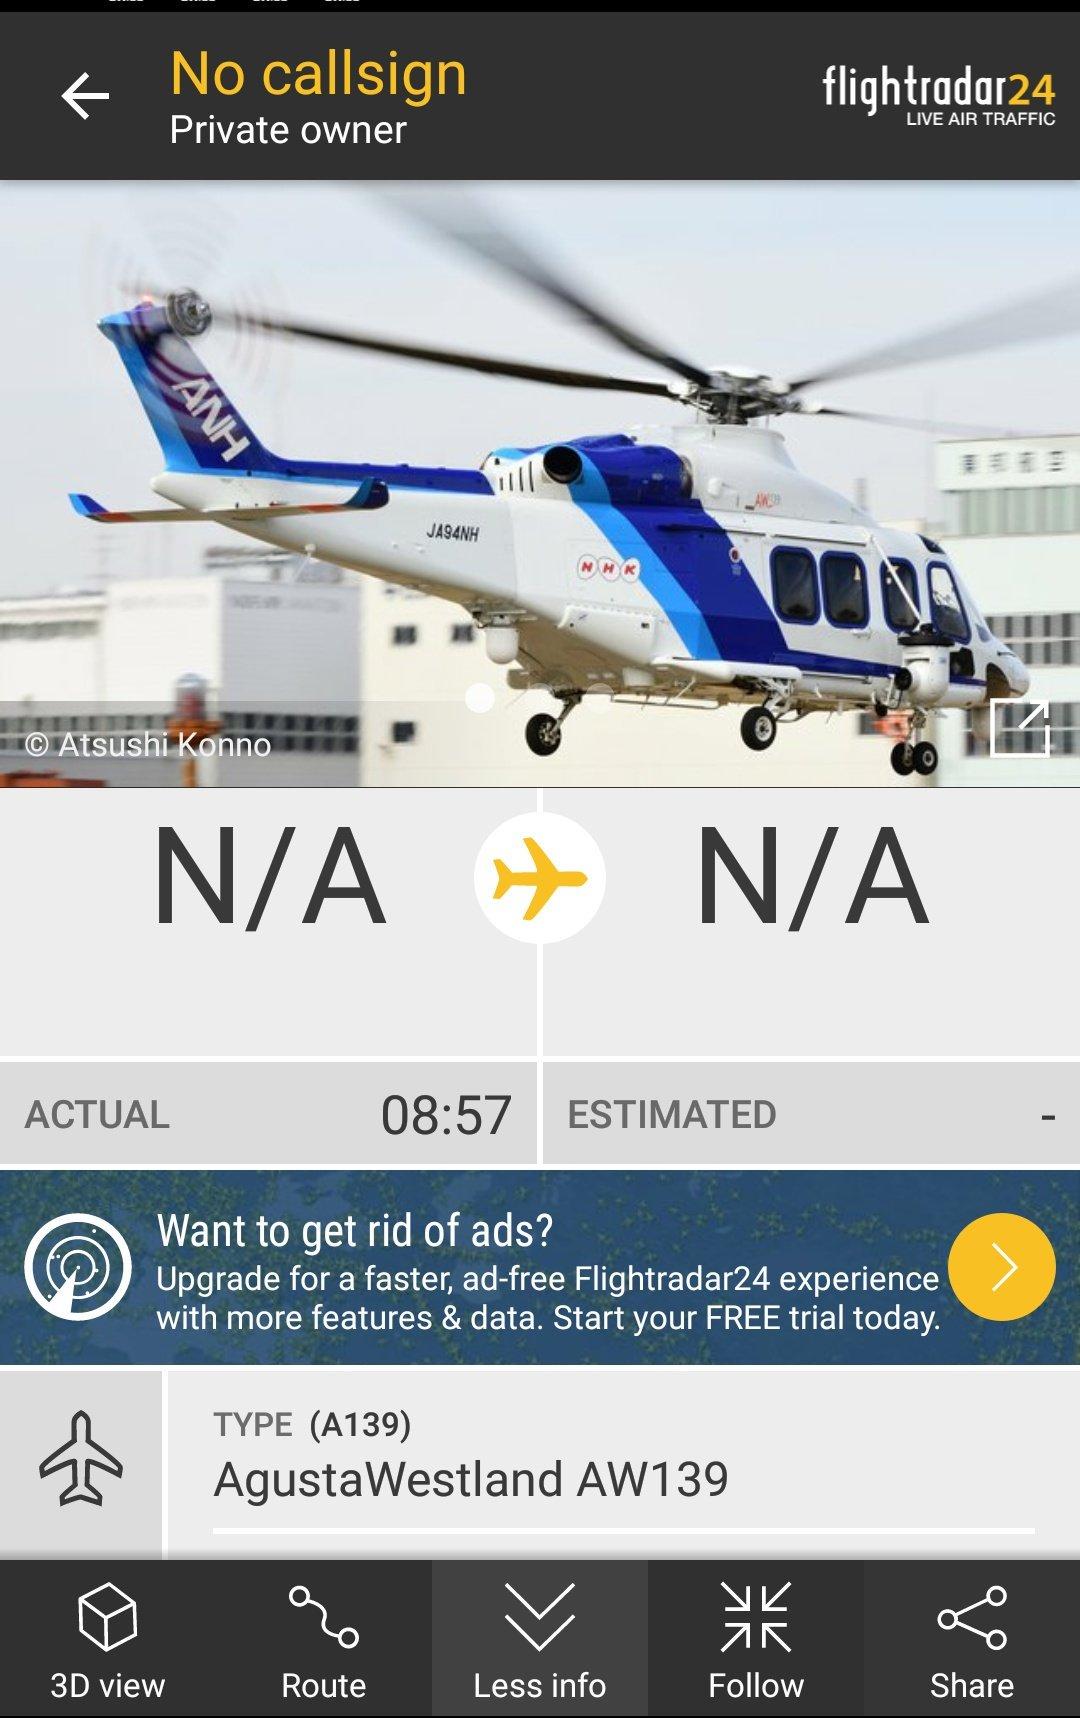 画像,#NHK 町田市交通死傷事故現場取材中ヘリコプター#flightradar24 https://t.co/HoHZwivFmv…